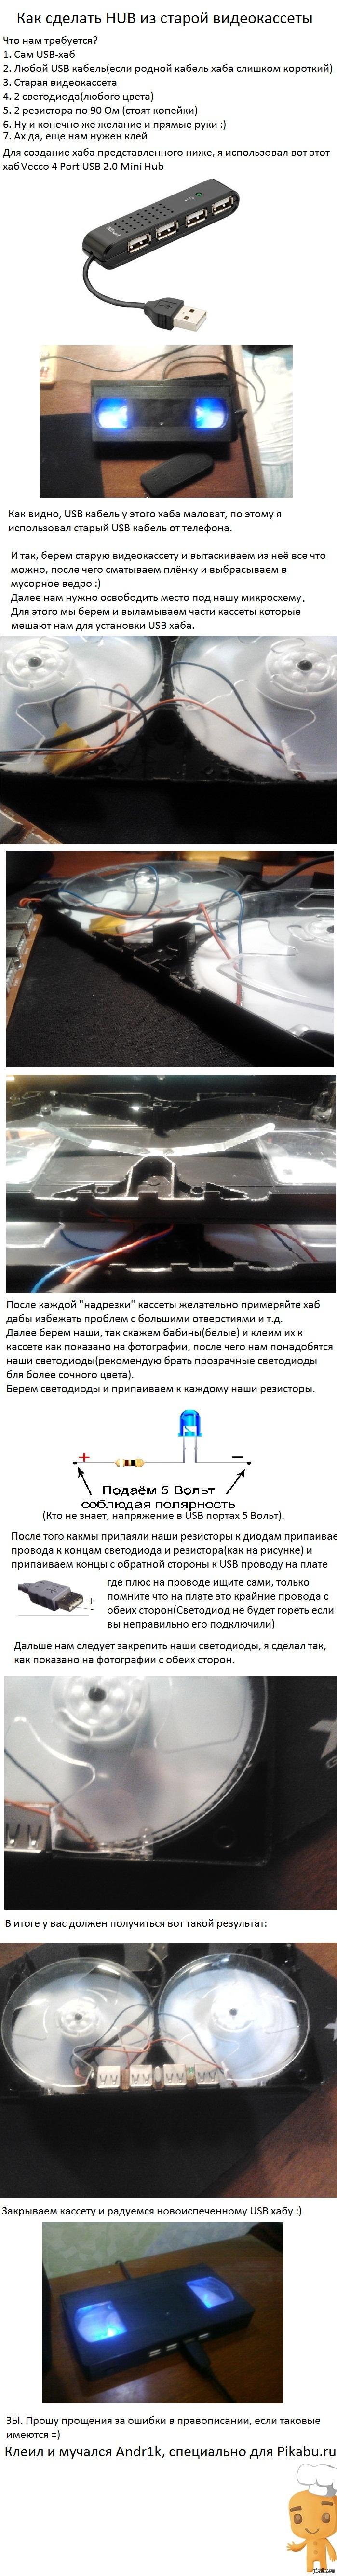 "Как сделать USB хаб с видеокассеты В продолжение поста <a href=""http://pikabu.ru/story/ne_poboyalsya_kriviznyi_svoikh_ruk_1893410"">http://pikabu.ru/story/_1893410</a>"